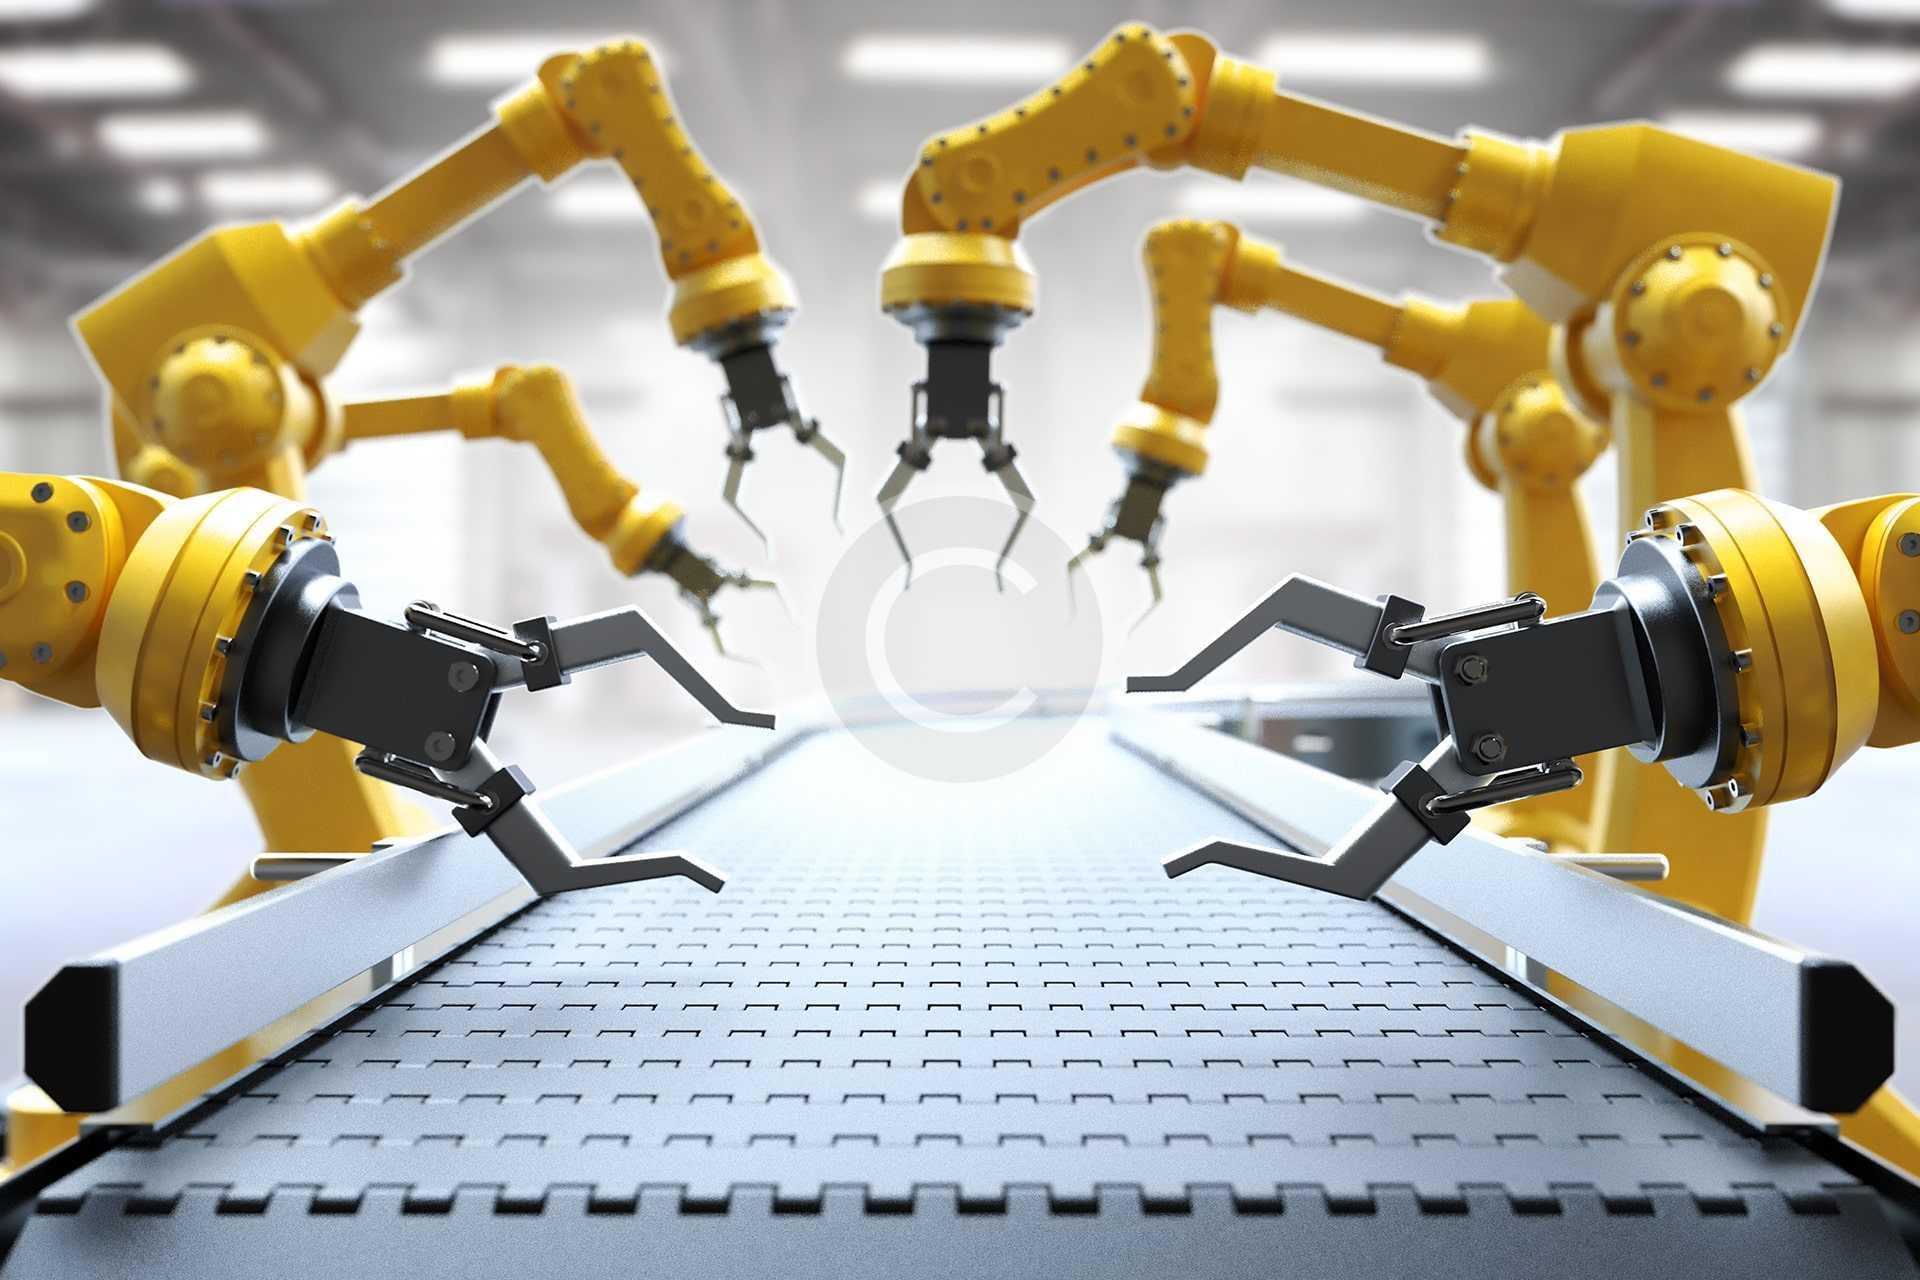 Dynamic Robots